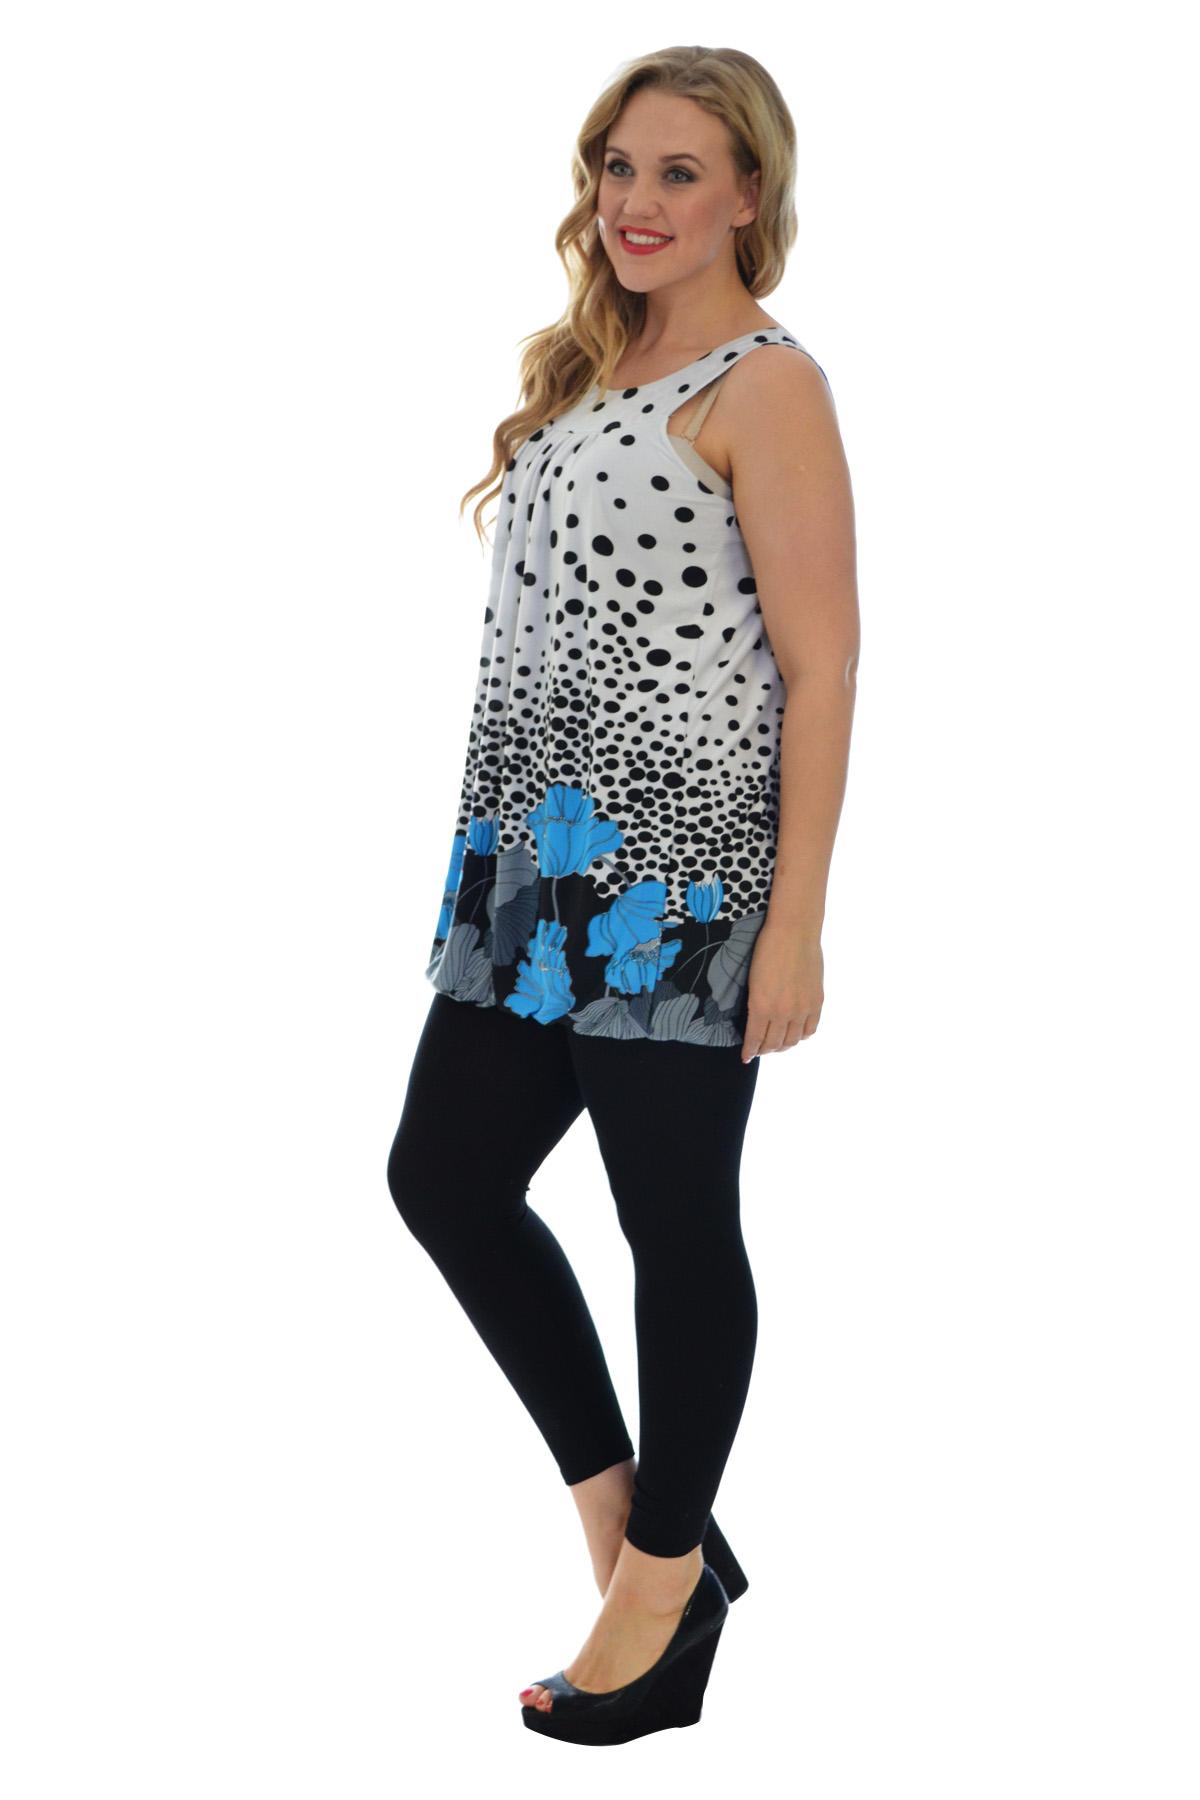 New Womens Top Floral Print Bubble Hem Polka Dot Sleeveless Plus Size Nouvelle